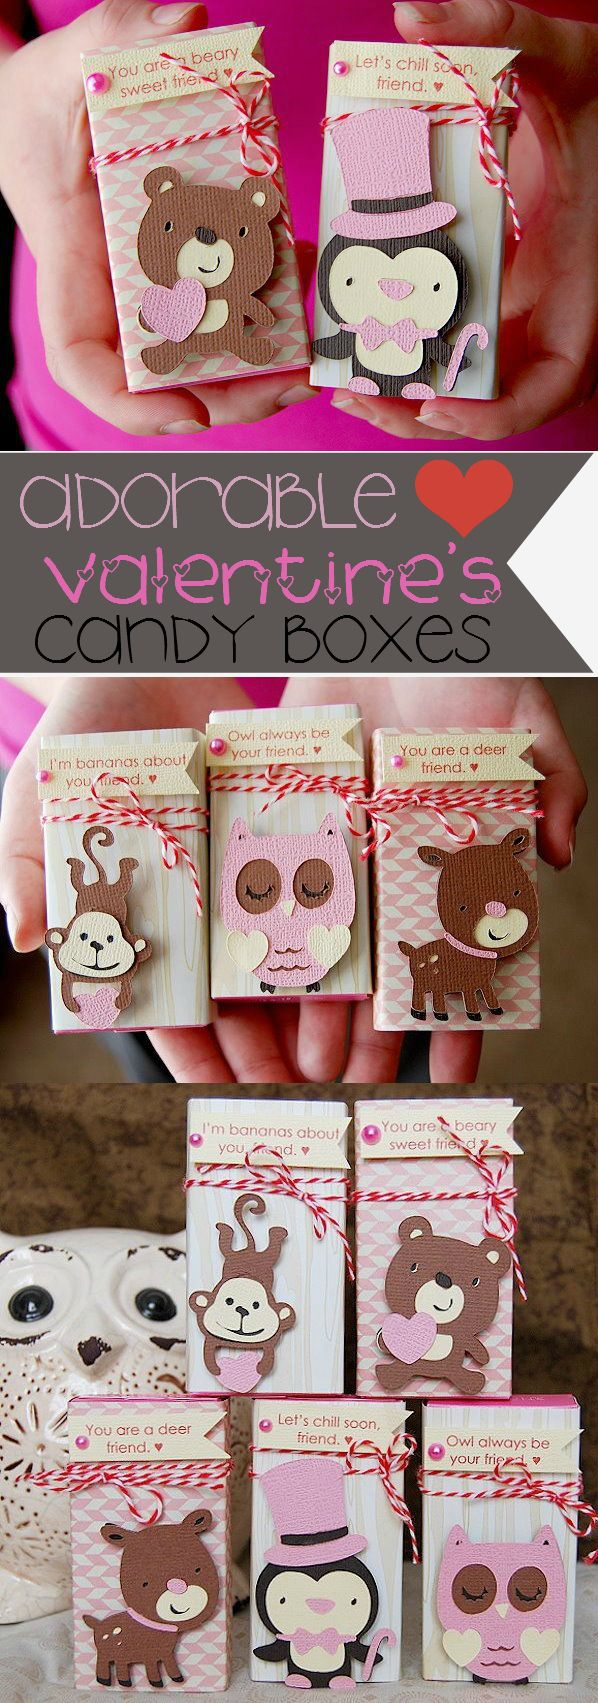 http://creativemeinspiredyou.com/cute-conversation-heart-box-wraps/  Valentine's, Valentine, Valentine's Day, love, conversation, conversation hearts, hearts, love, kids, kids crafts, kids craft, class, party,gifts, crafty, wraps, boxes, diy, handmade, homemade.